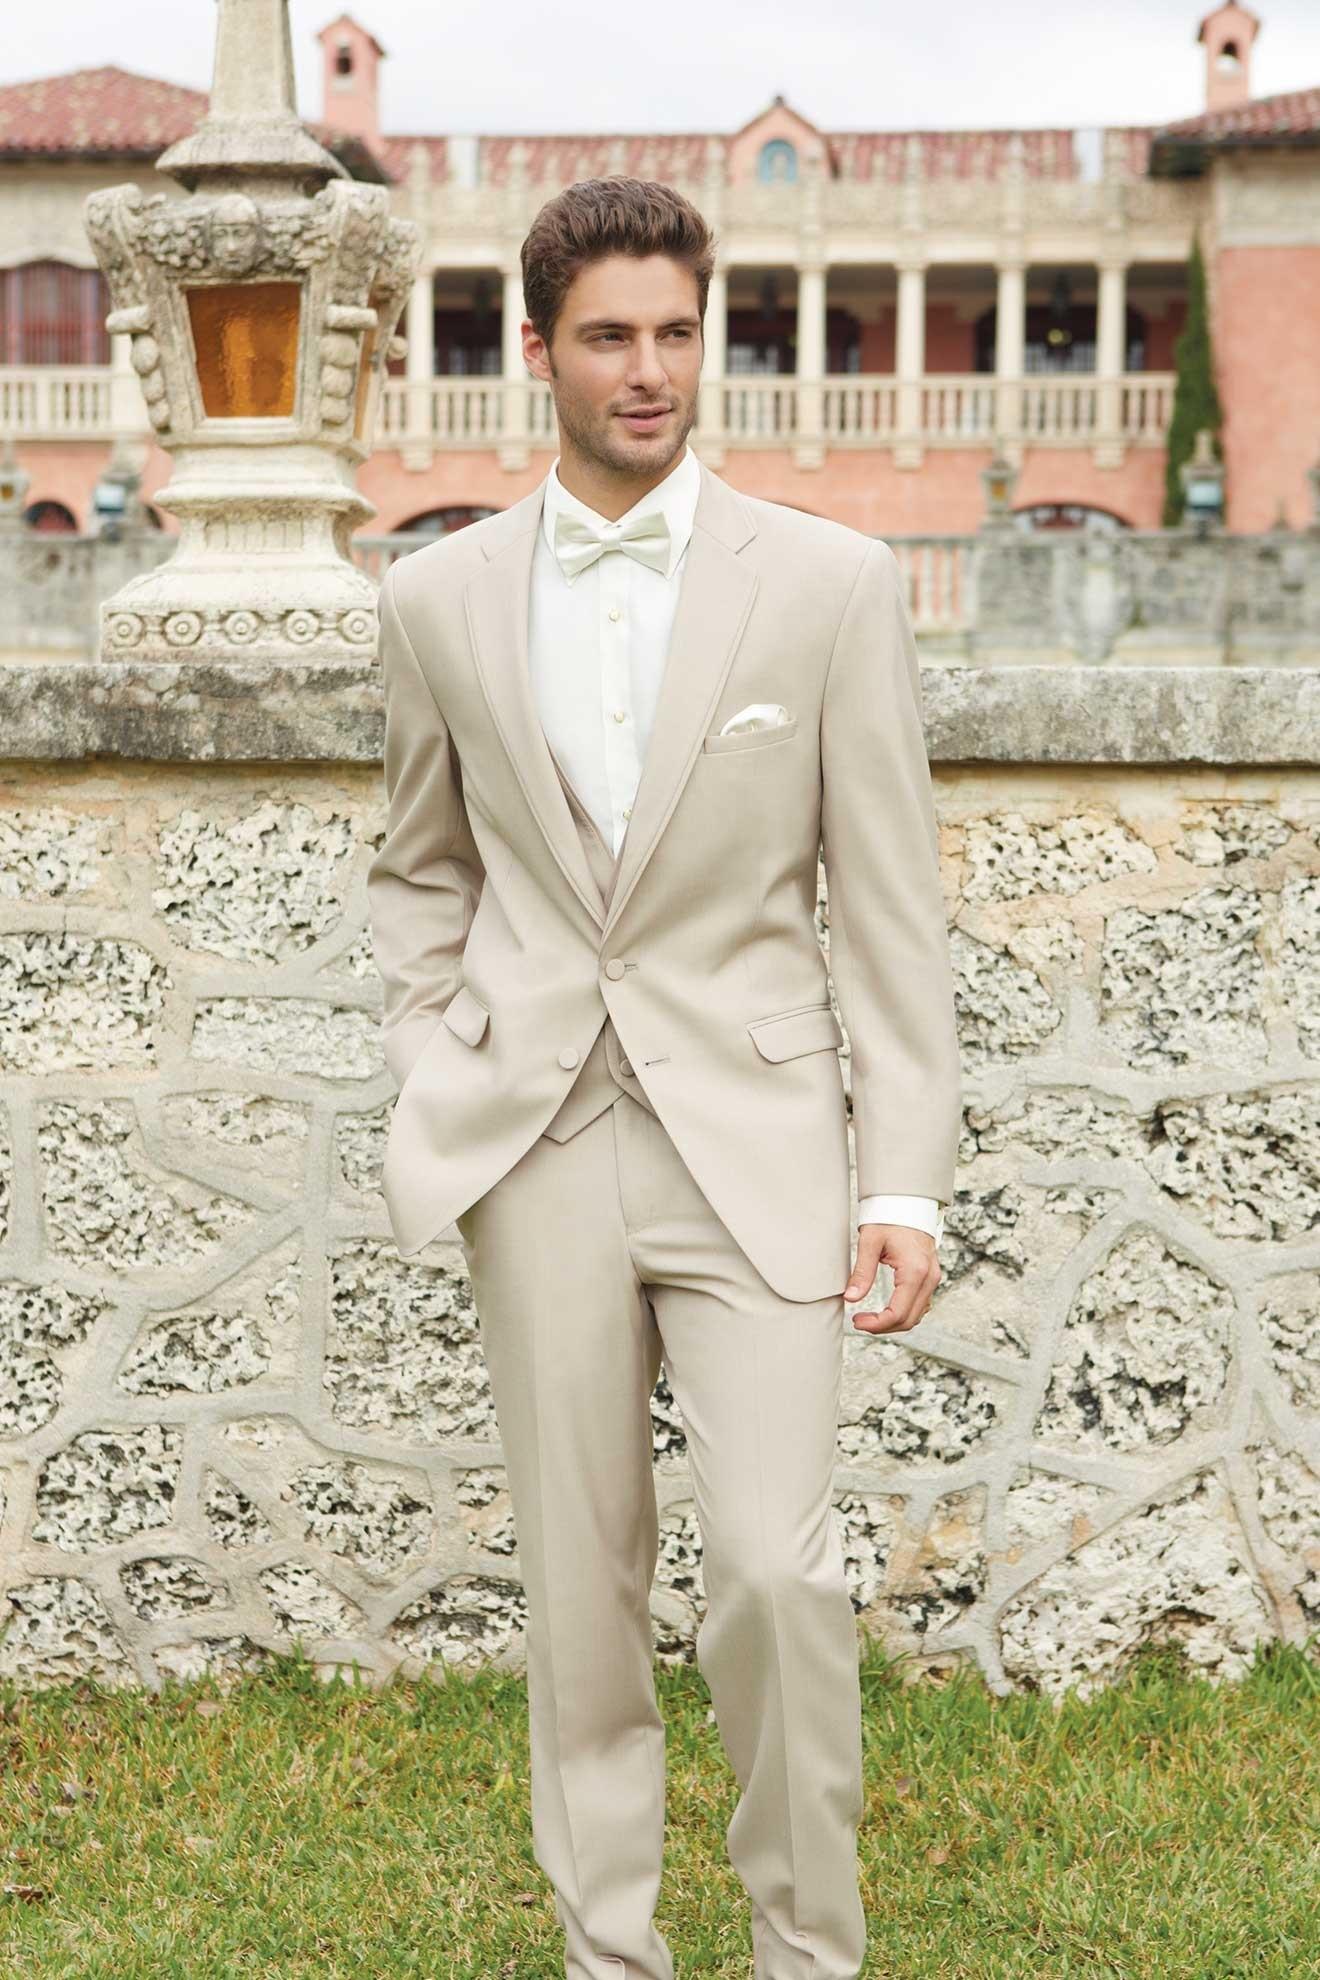 MFWtux.com - Tan Allure Men Wedding Suit